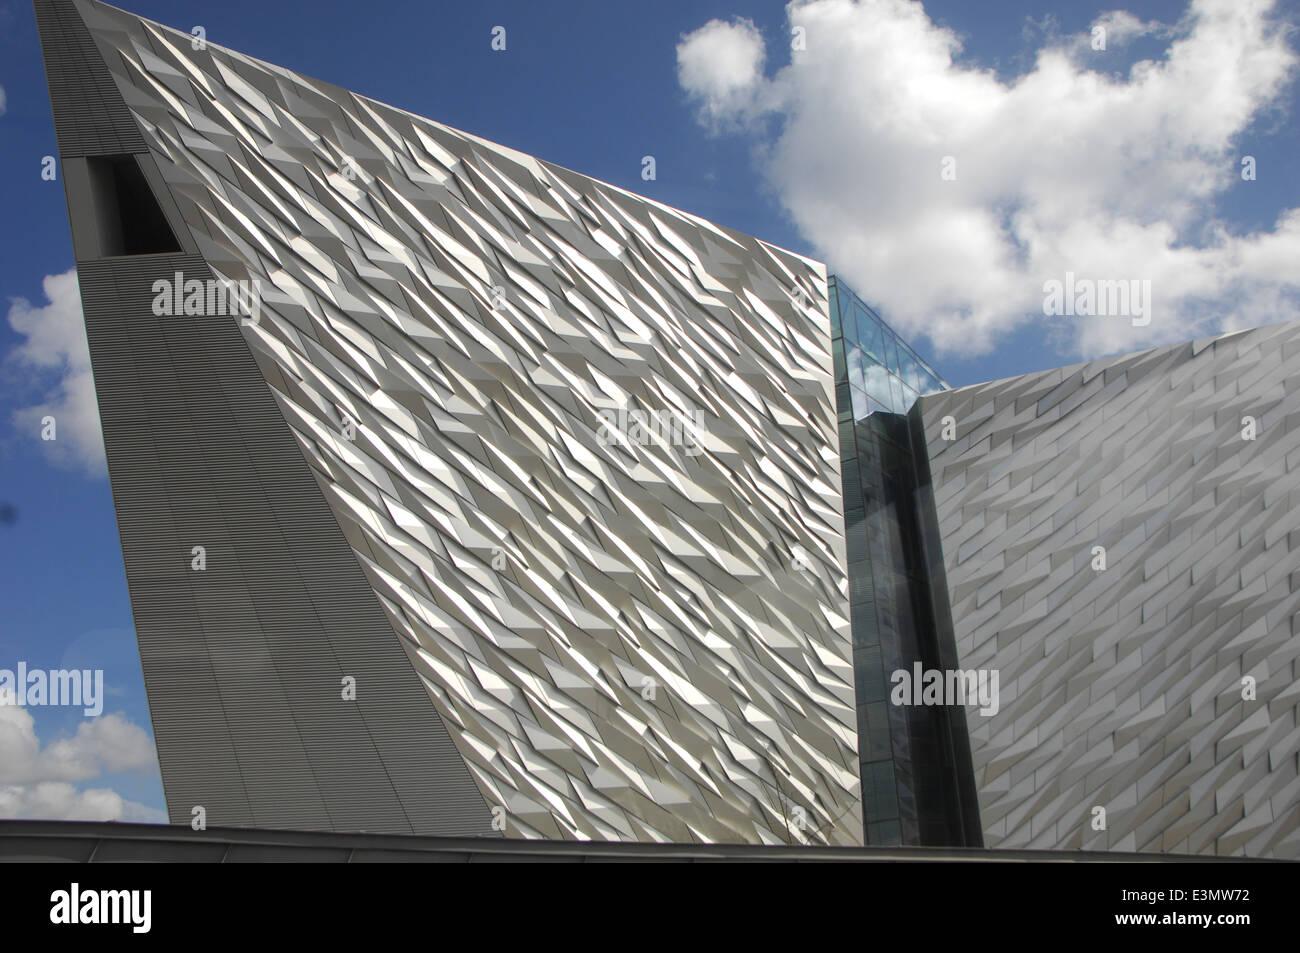 The Titanic Museum. - Stock Image